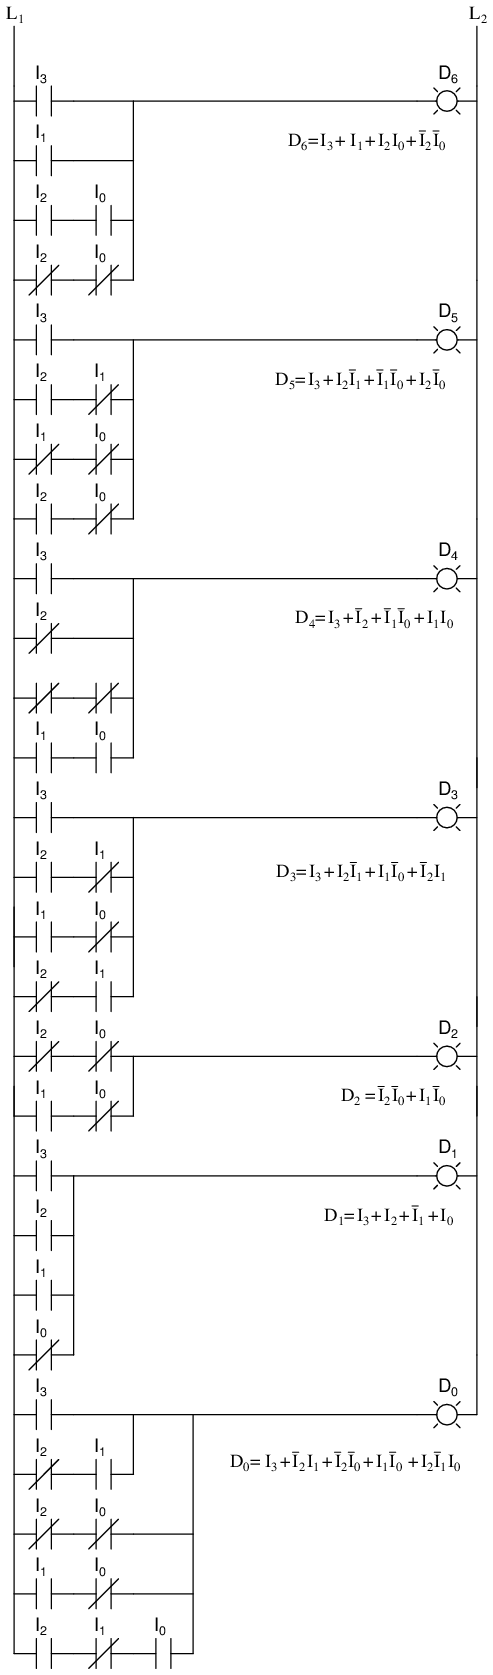 medium resolution of the resulting ladder diagram